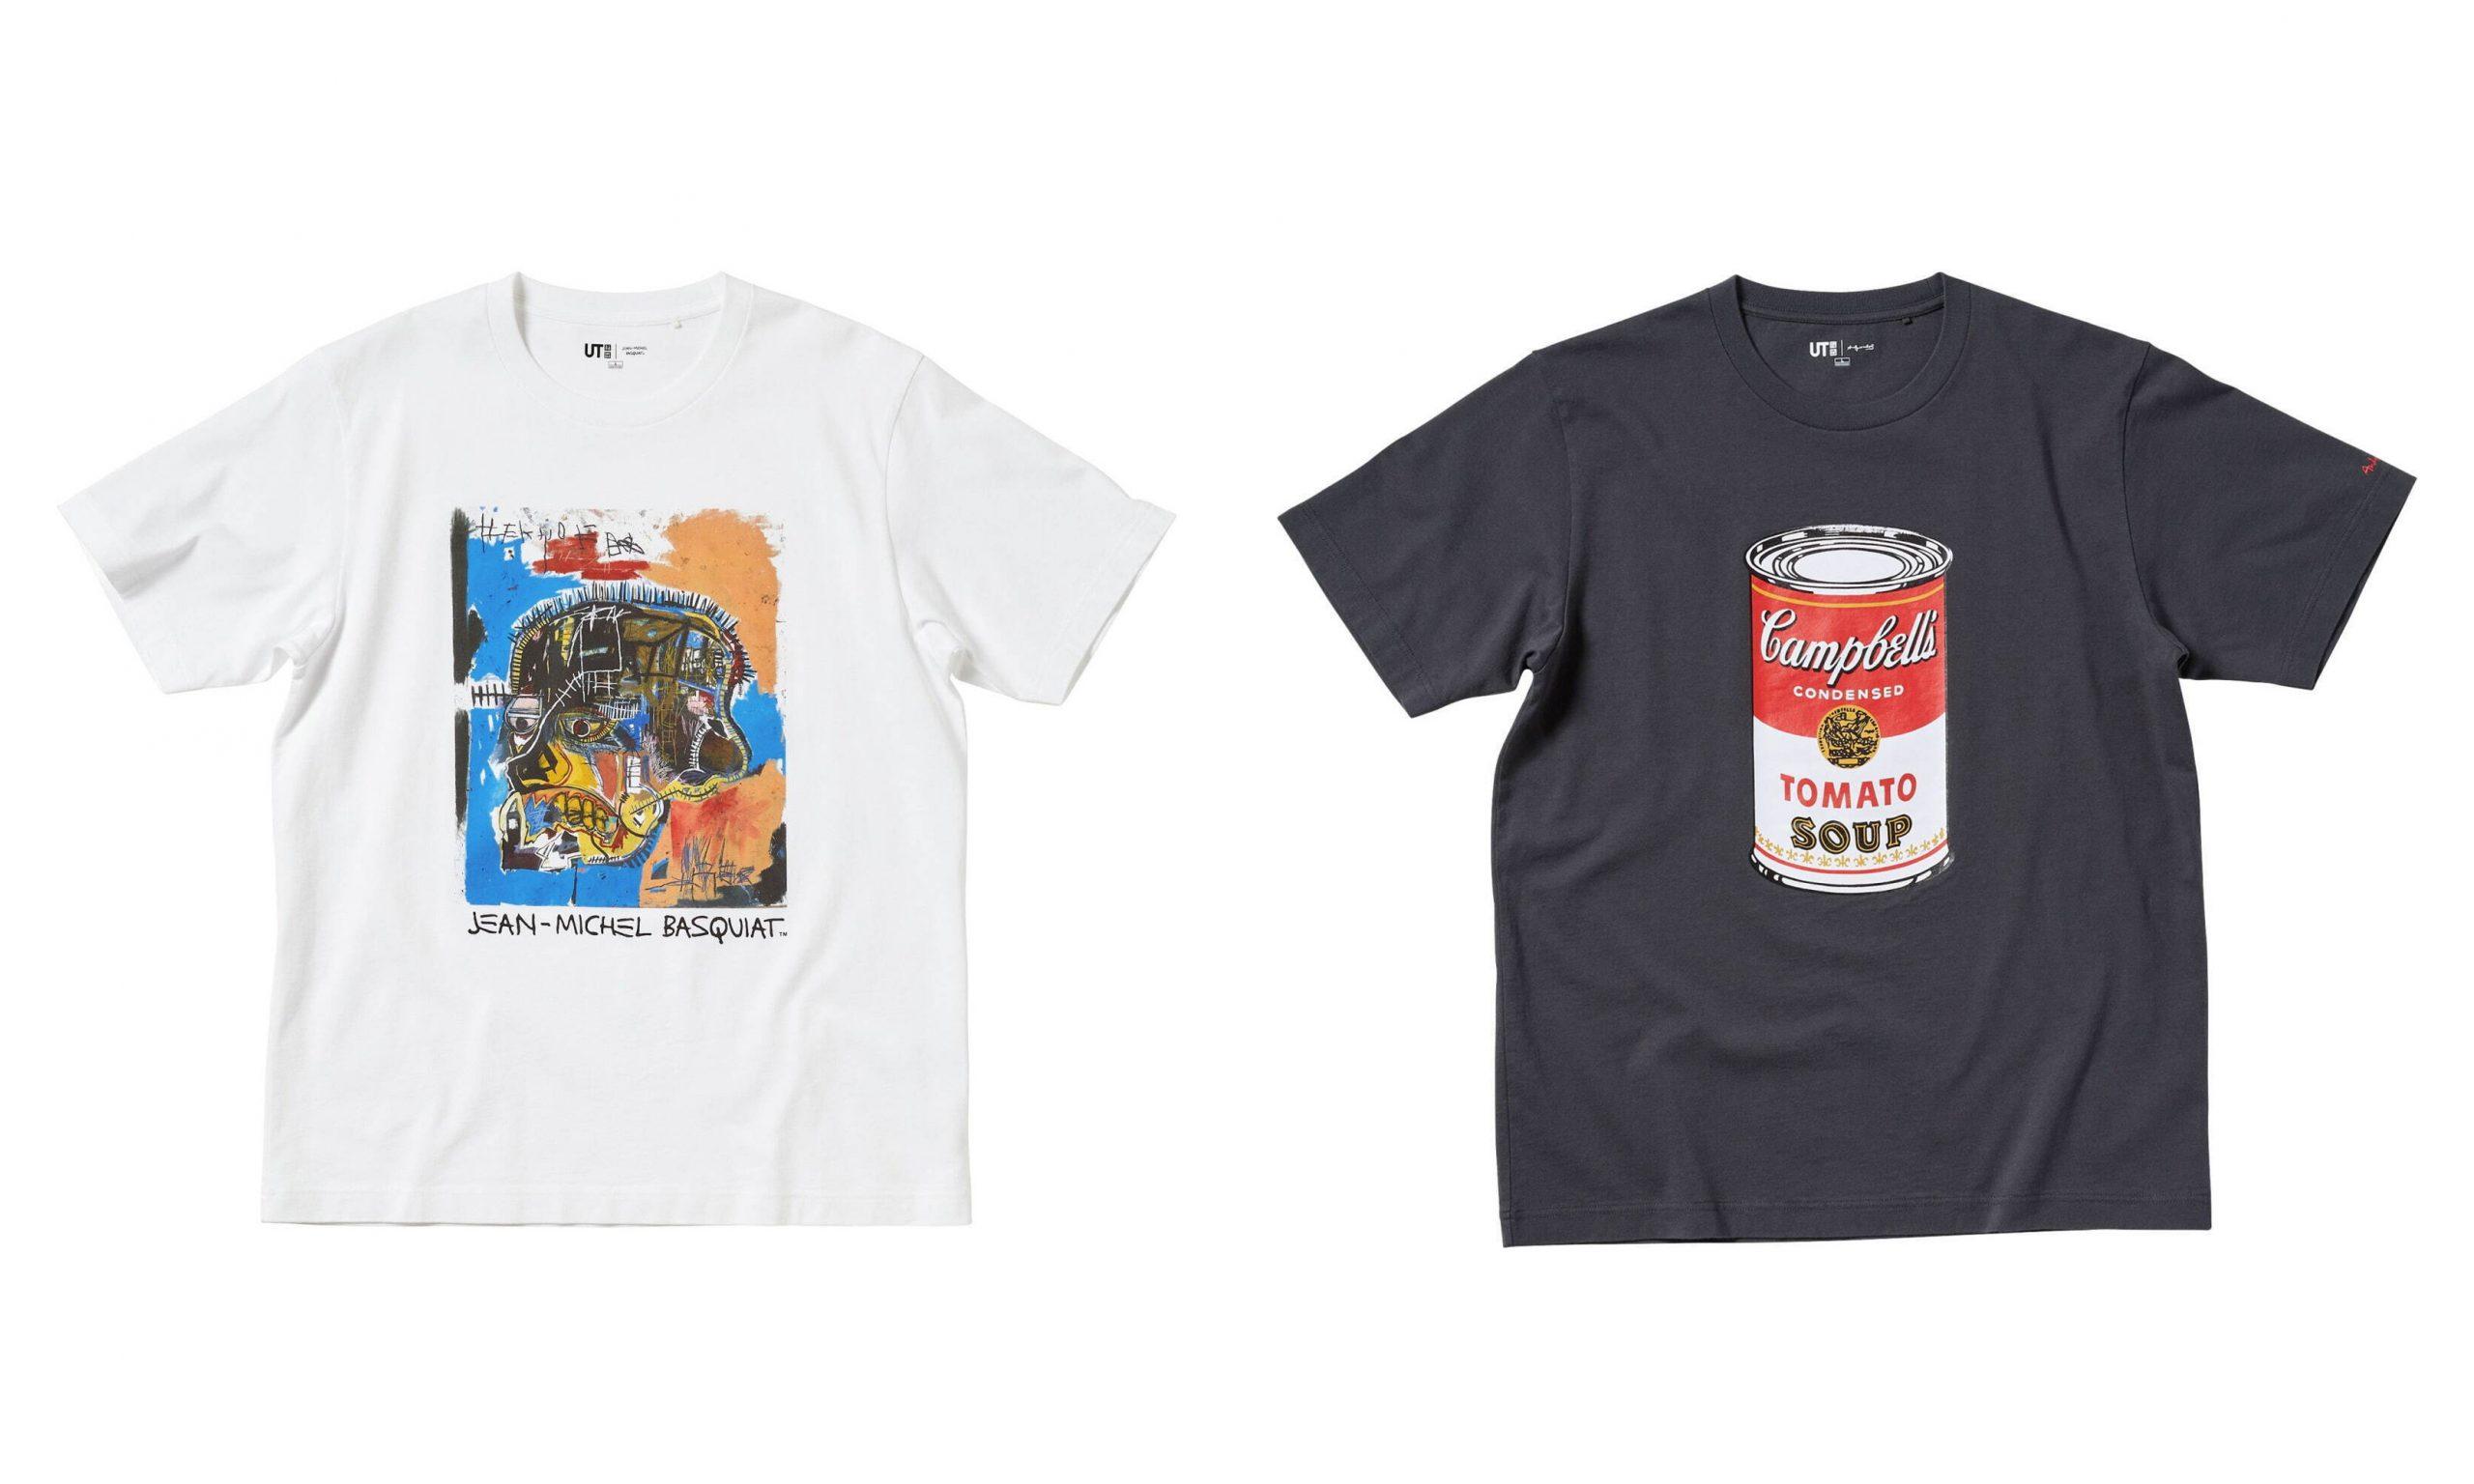 UNIQLO UT 携手 Andy Warhol、Keith Haring、Jean-Michel Basquiat 推出全新联名系列